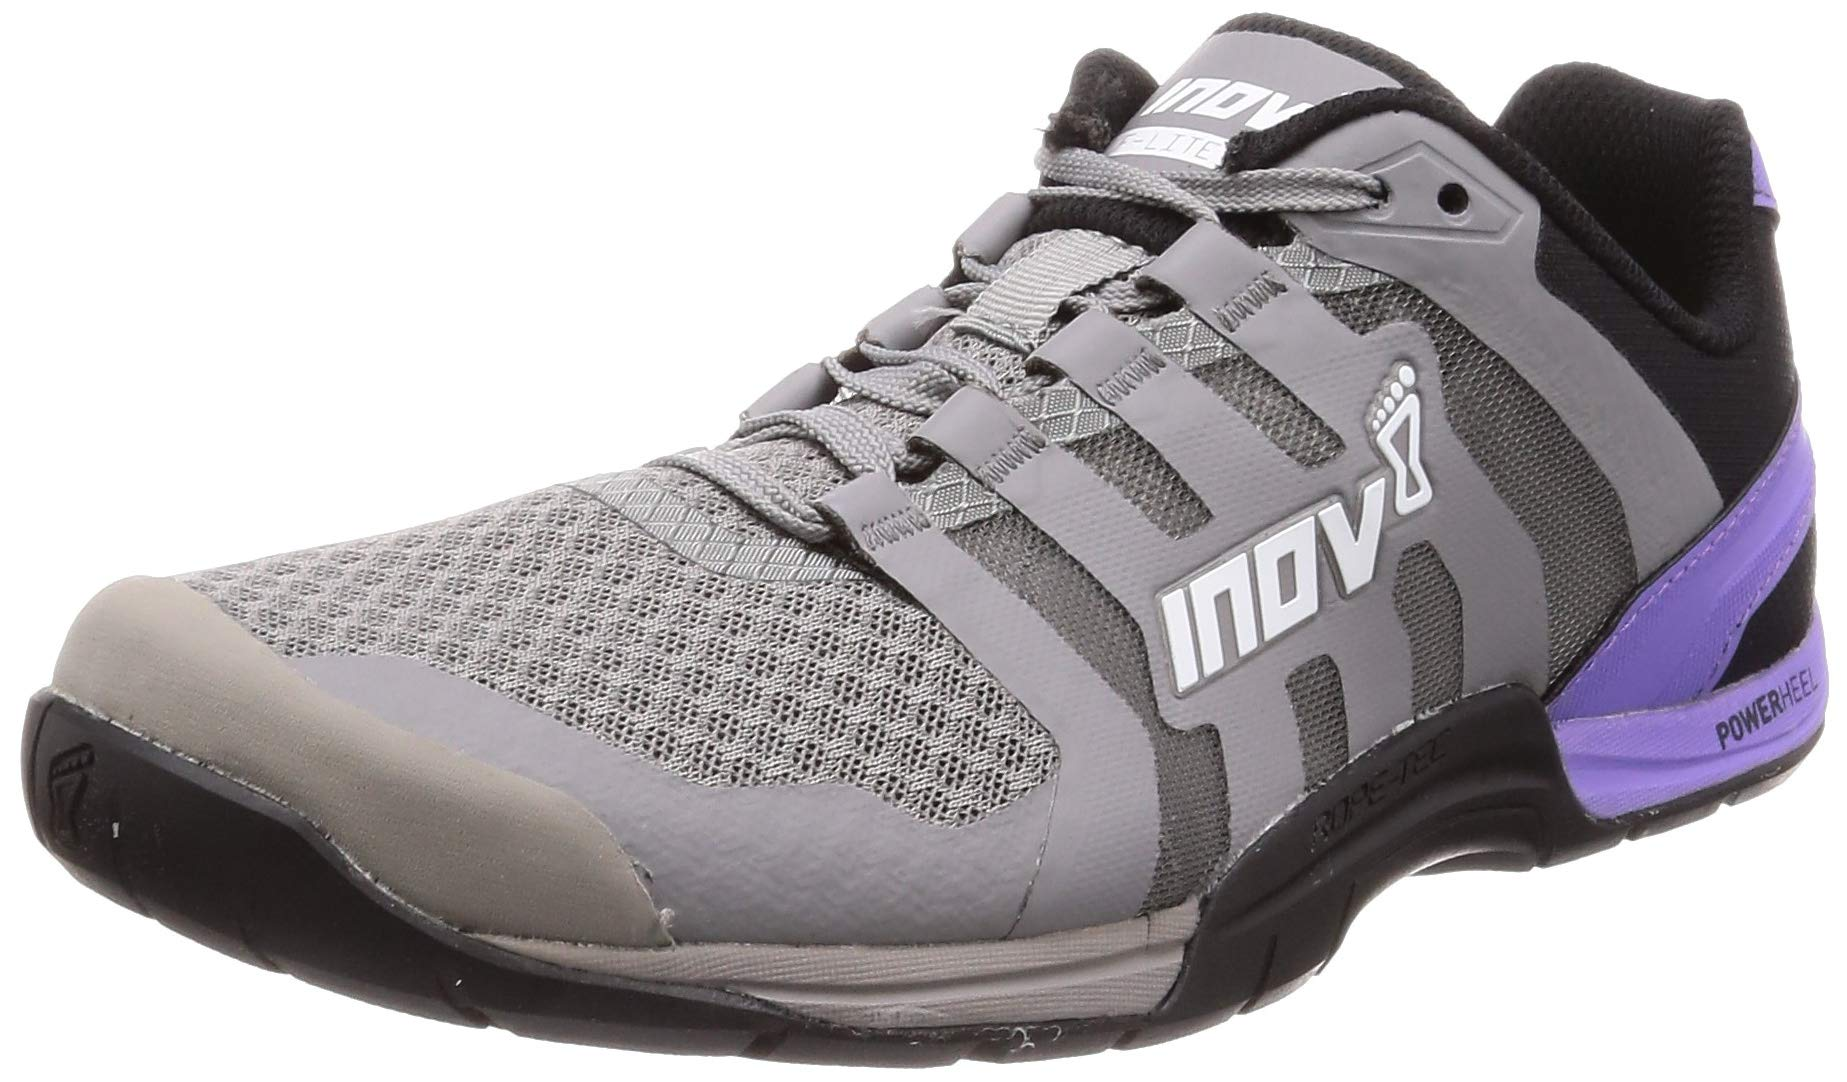 Inov-8 Womens F-Lite 235 V2 - Lightweight Minimalist Cross Training Shoes - Zero Drop - Athletic Shoe for Gym, Training and Weight Lifting - Wide Toe Box - Grey/Purple M4.5/ W6 by Inov-8